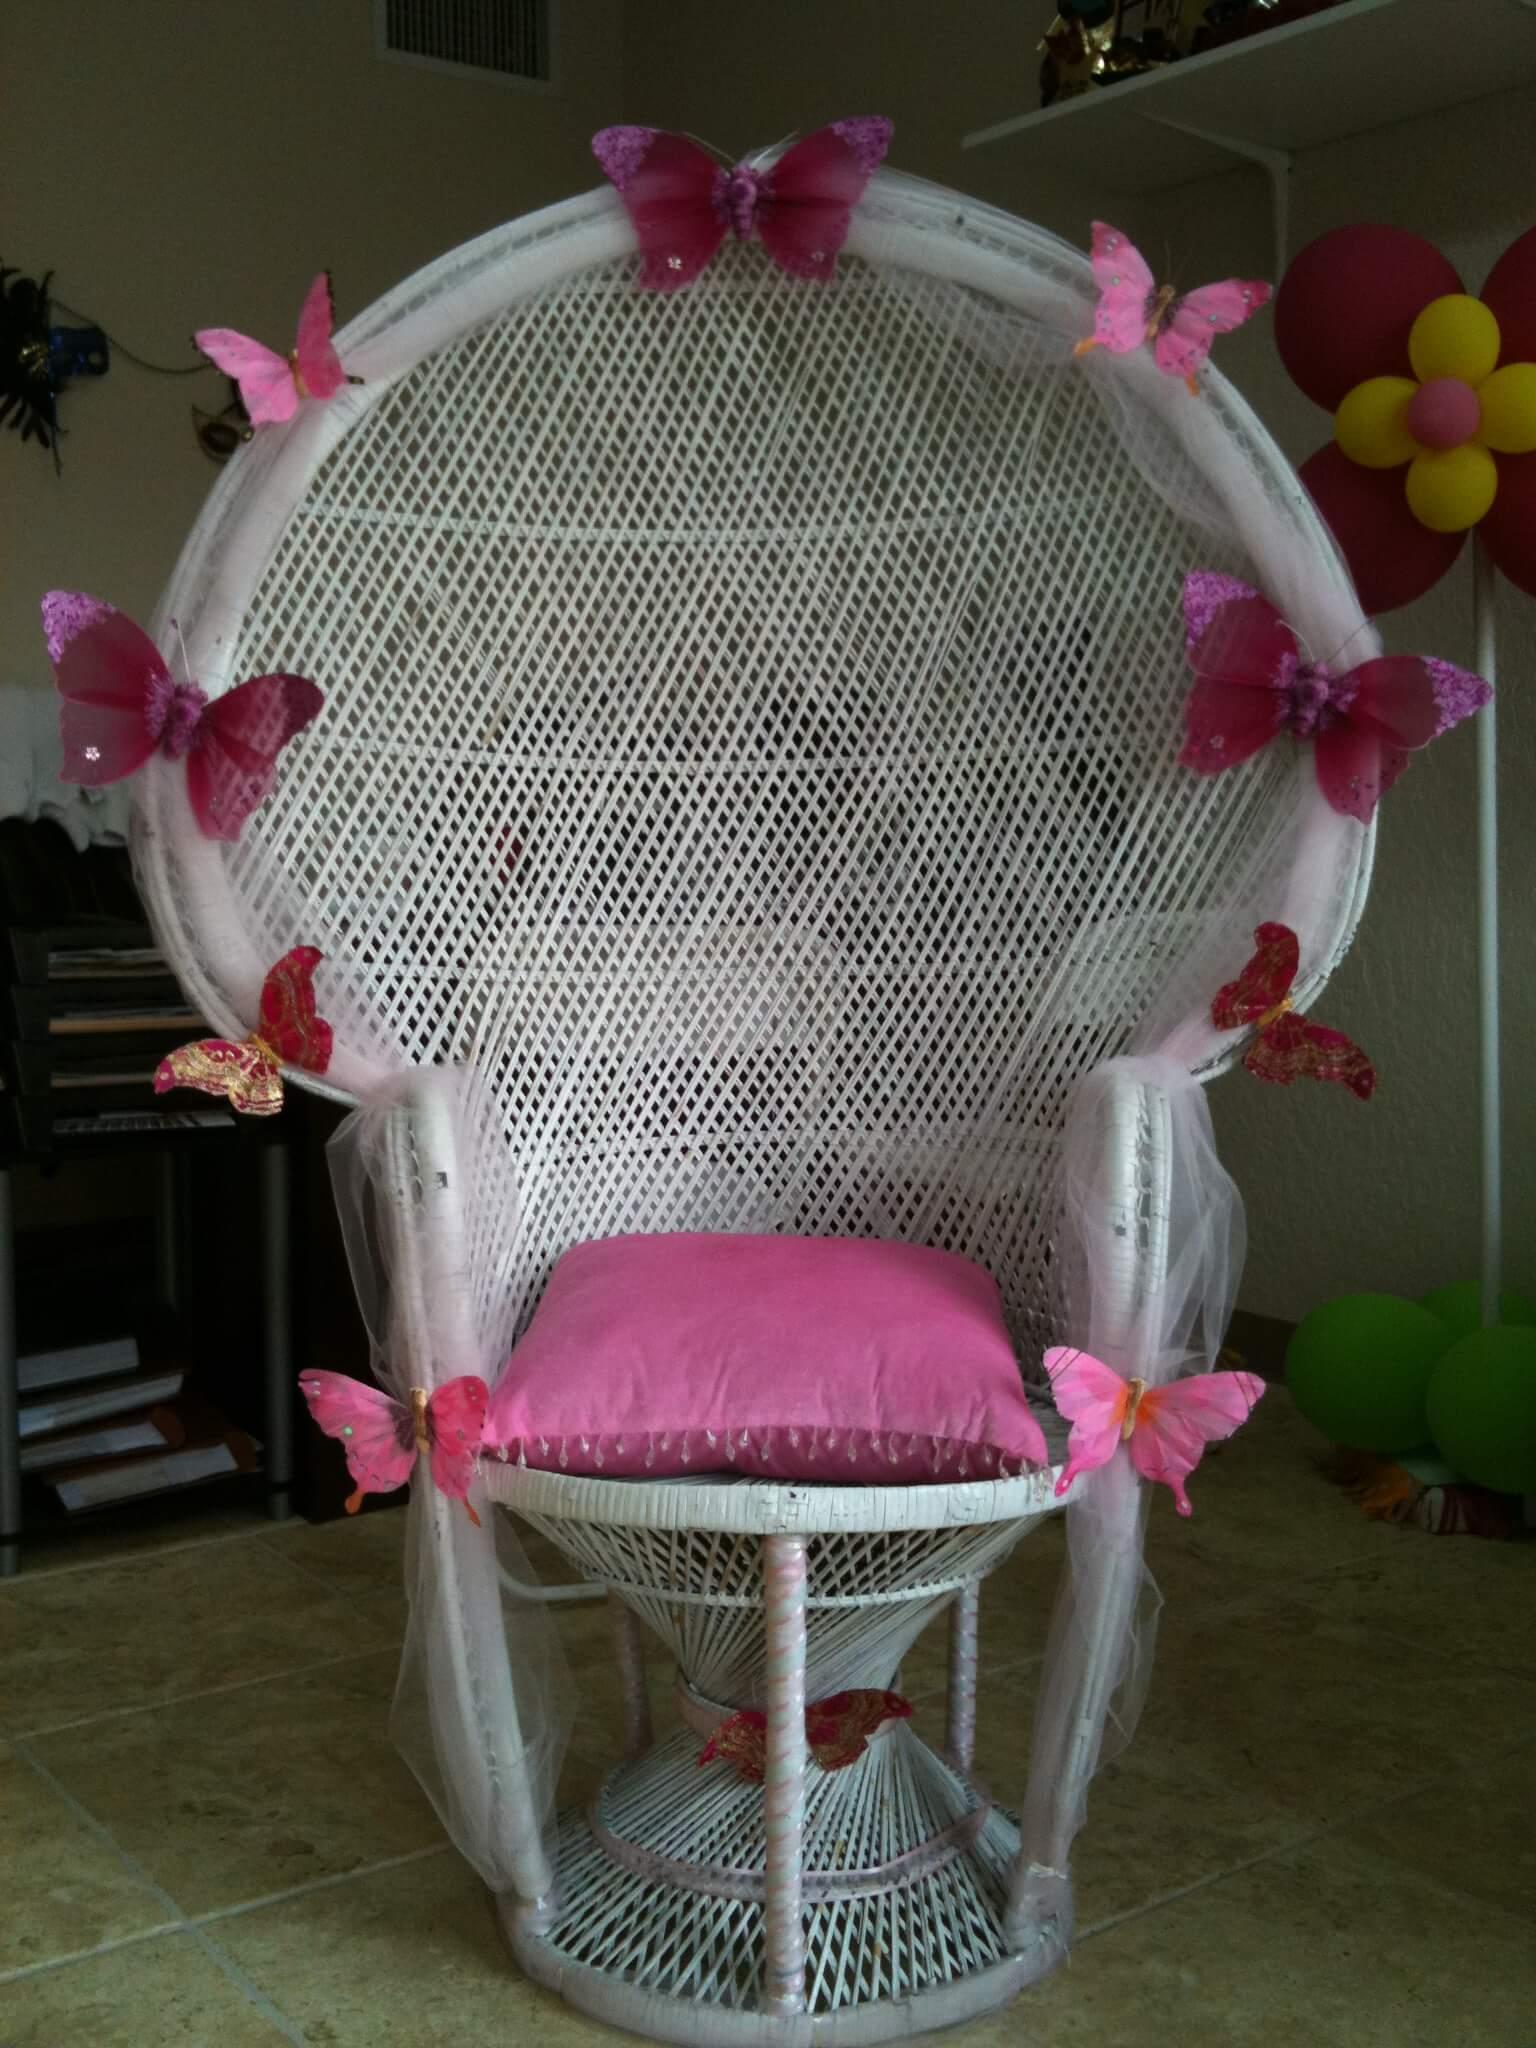 Baby shower chair ideas baby shower chair ideas